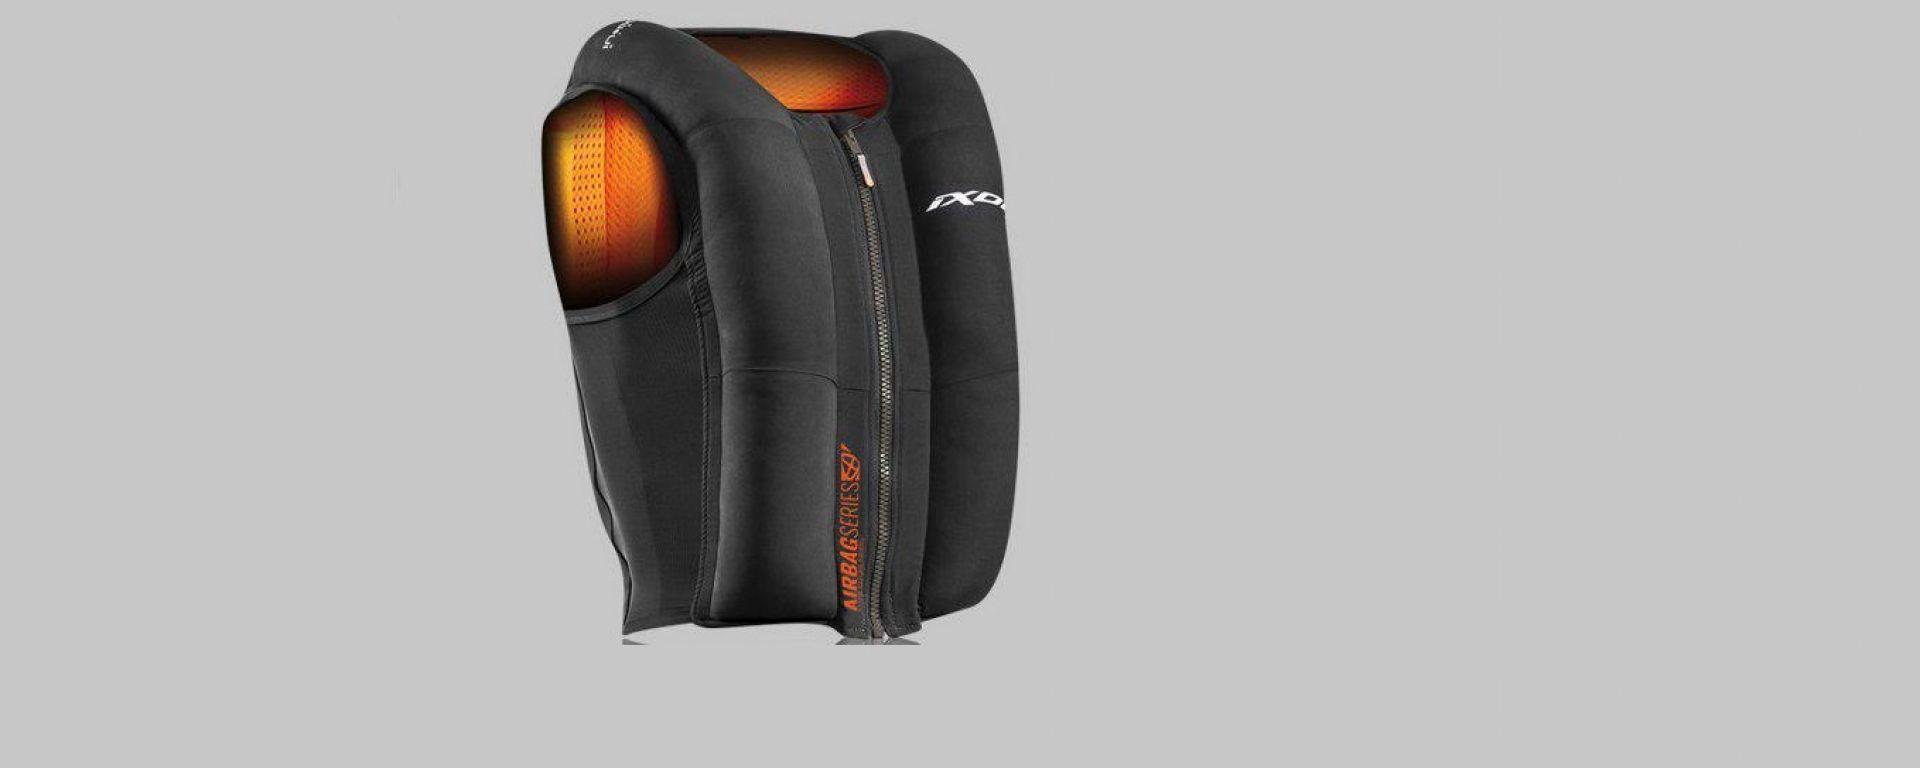 L'airbag Ixon IX-AIRBAG UO3